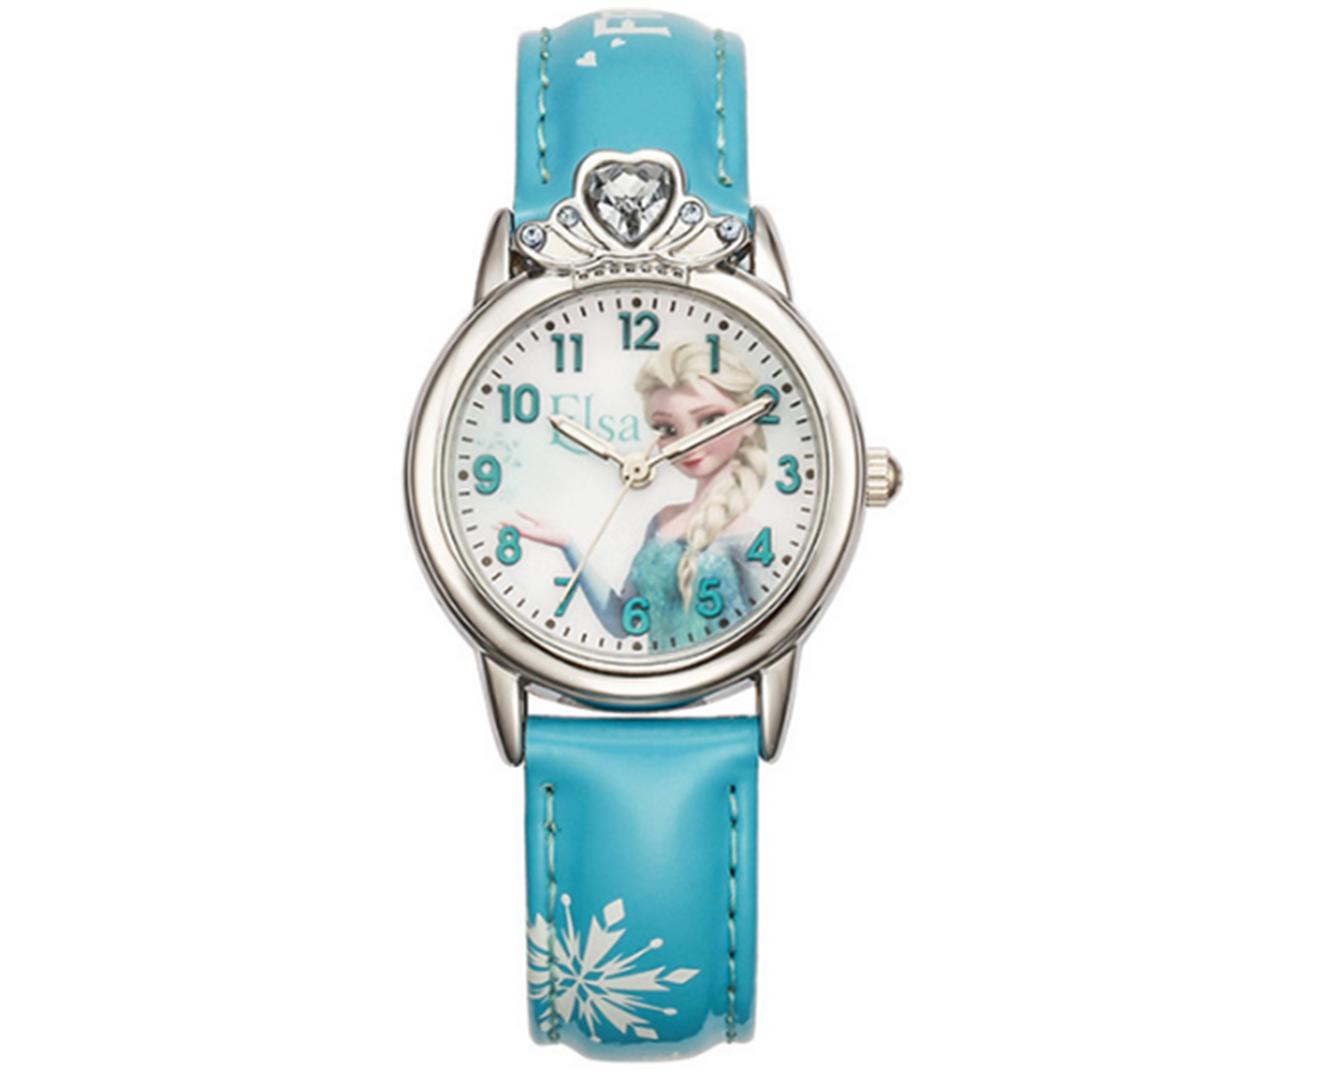 Creative Frozen Romance Watch Shiny Crown Princess Series Quartz Watch Suitable for Primary School Children-2